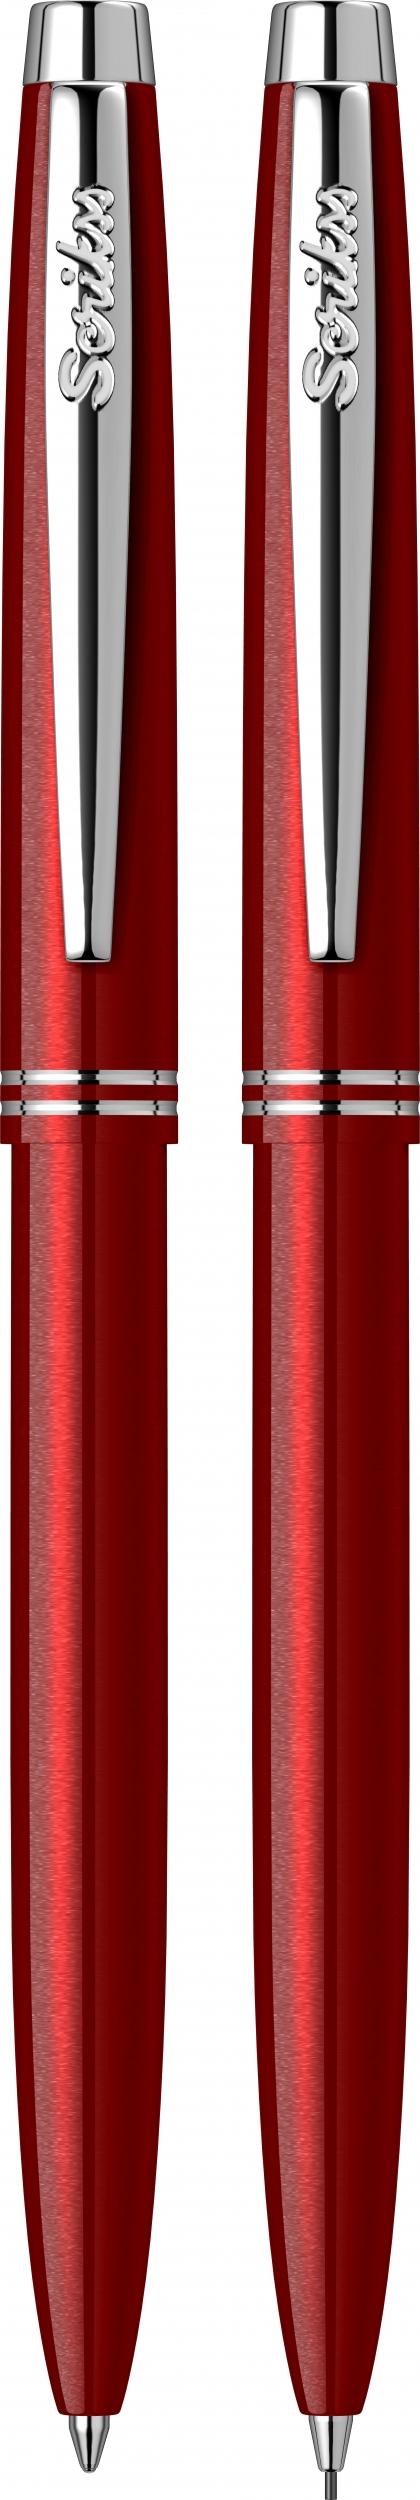 Двоен комплект Автоматична химикалка + Автоматичен молив  Scrikss, модел 81935,  Prestige 108 Червен